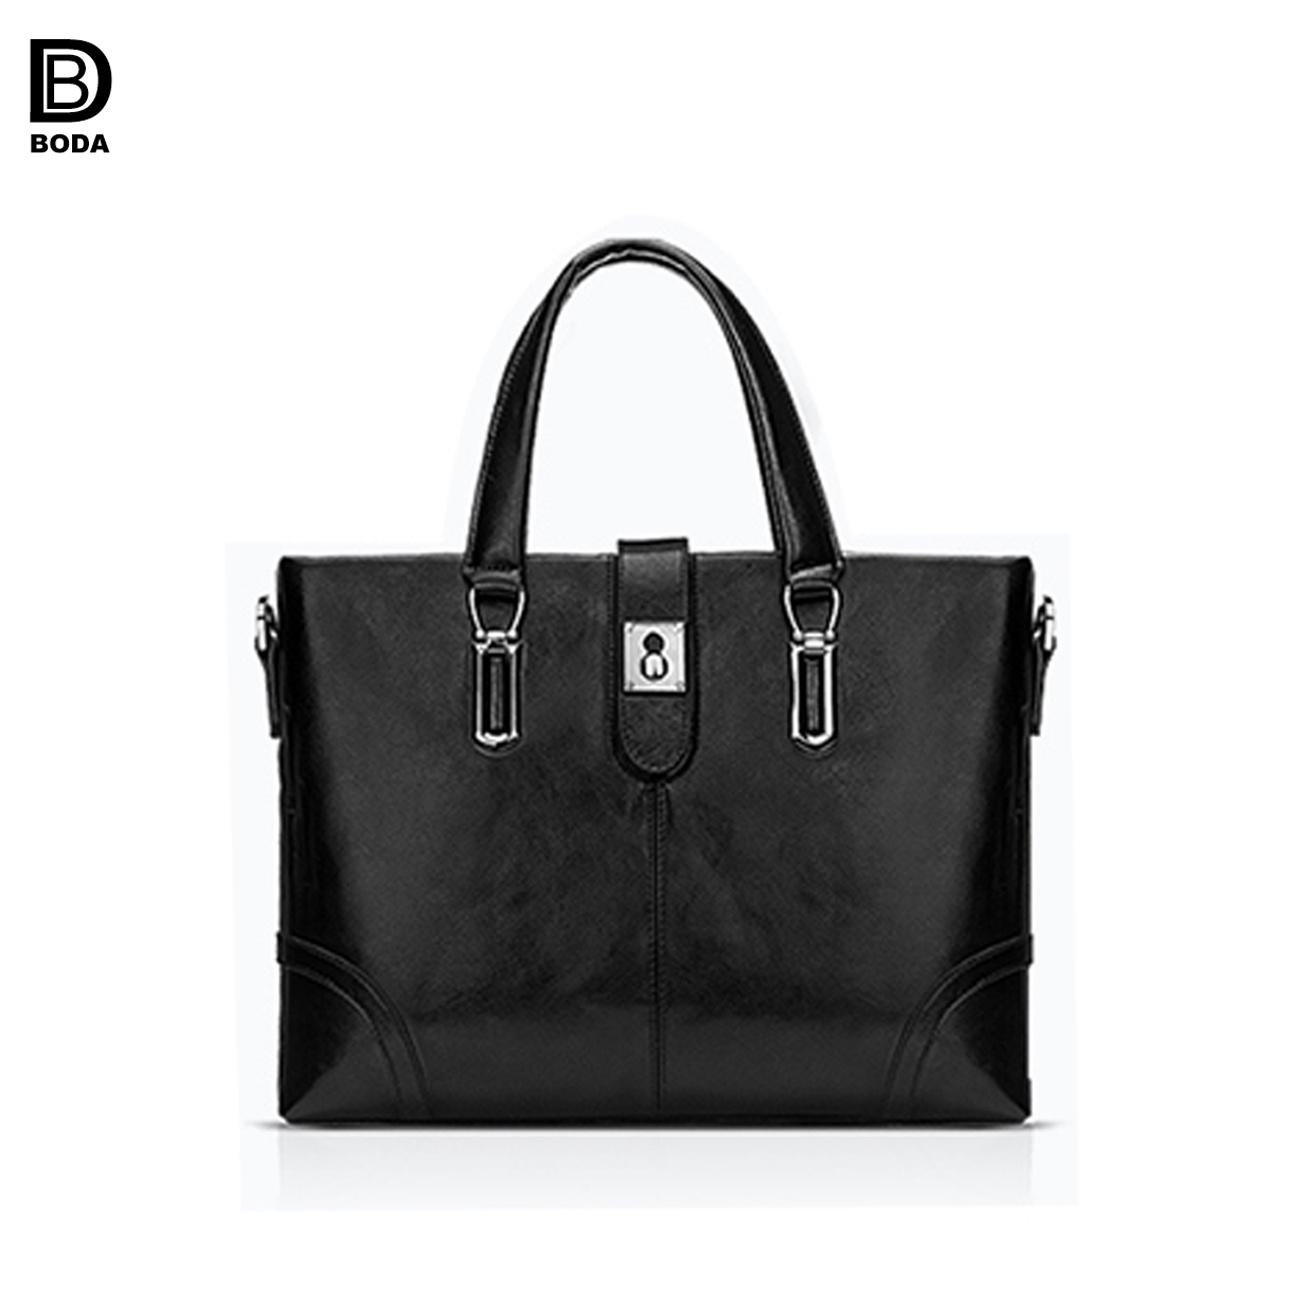 8a61b6b1ab China 2018 New Models Brands Leather Man Bag Business Travel Handbag -  China Business Men Bag